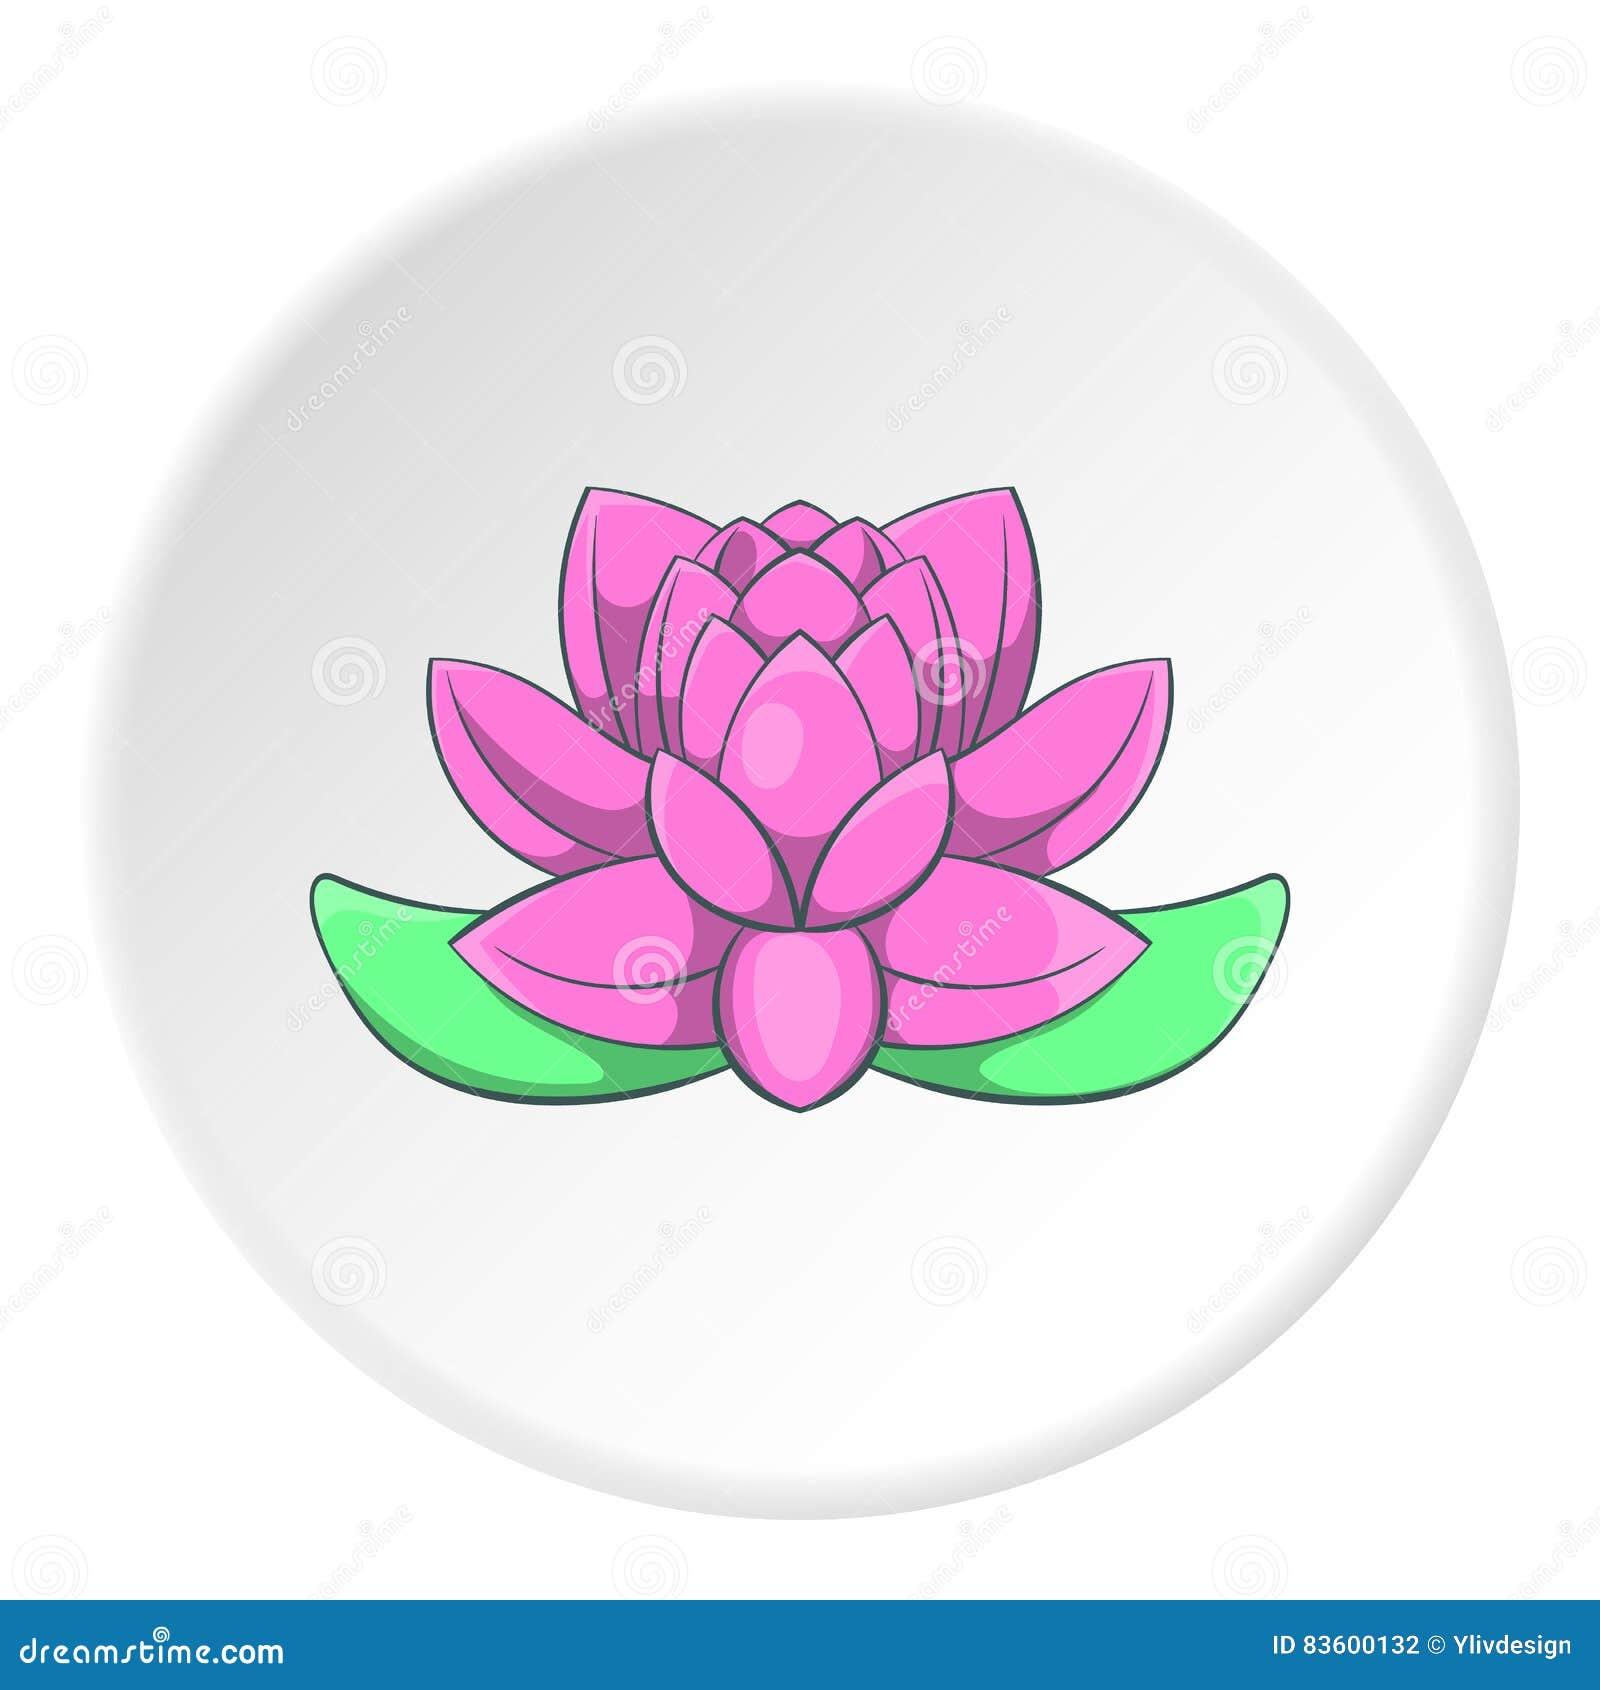 Lotus Flower Icon Cartoon Style Stock Vector Illustration Of